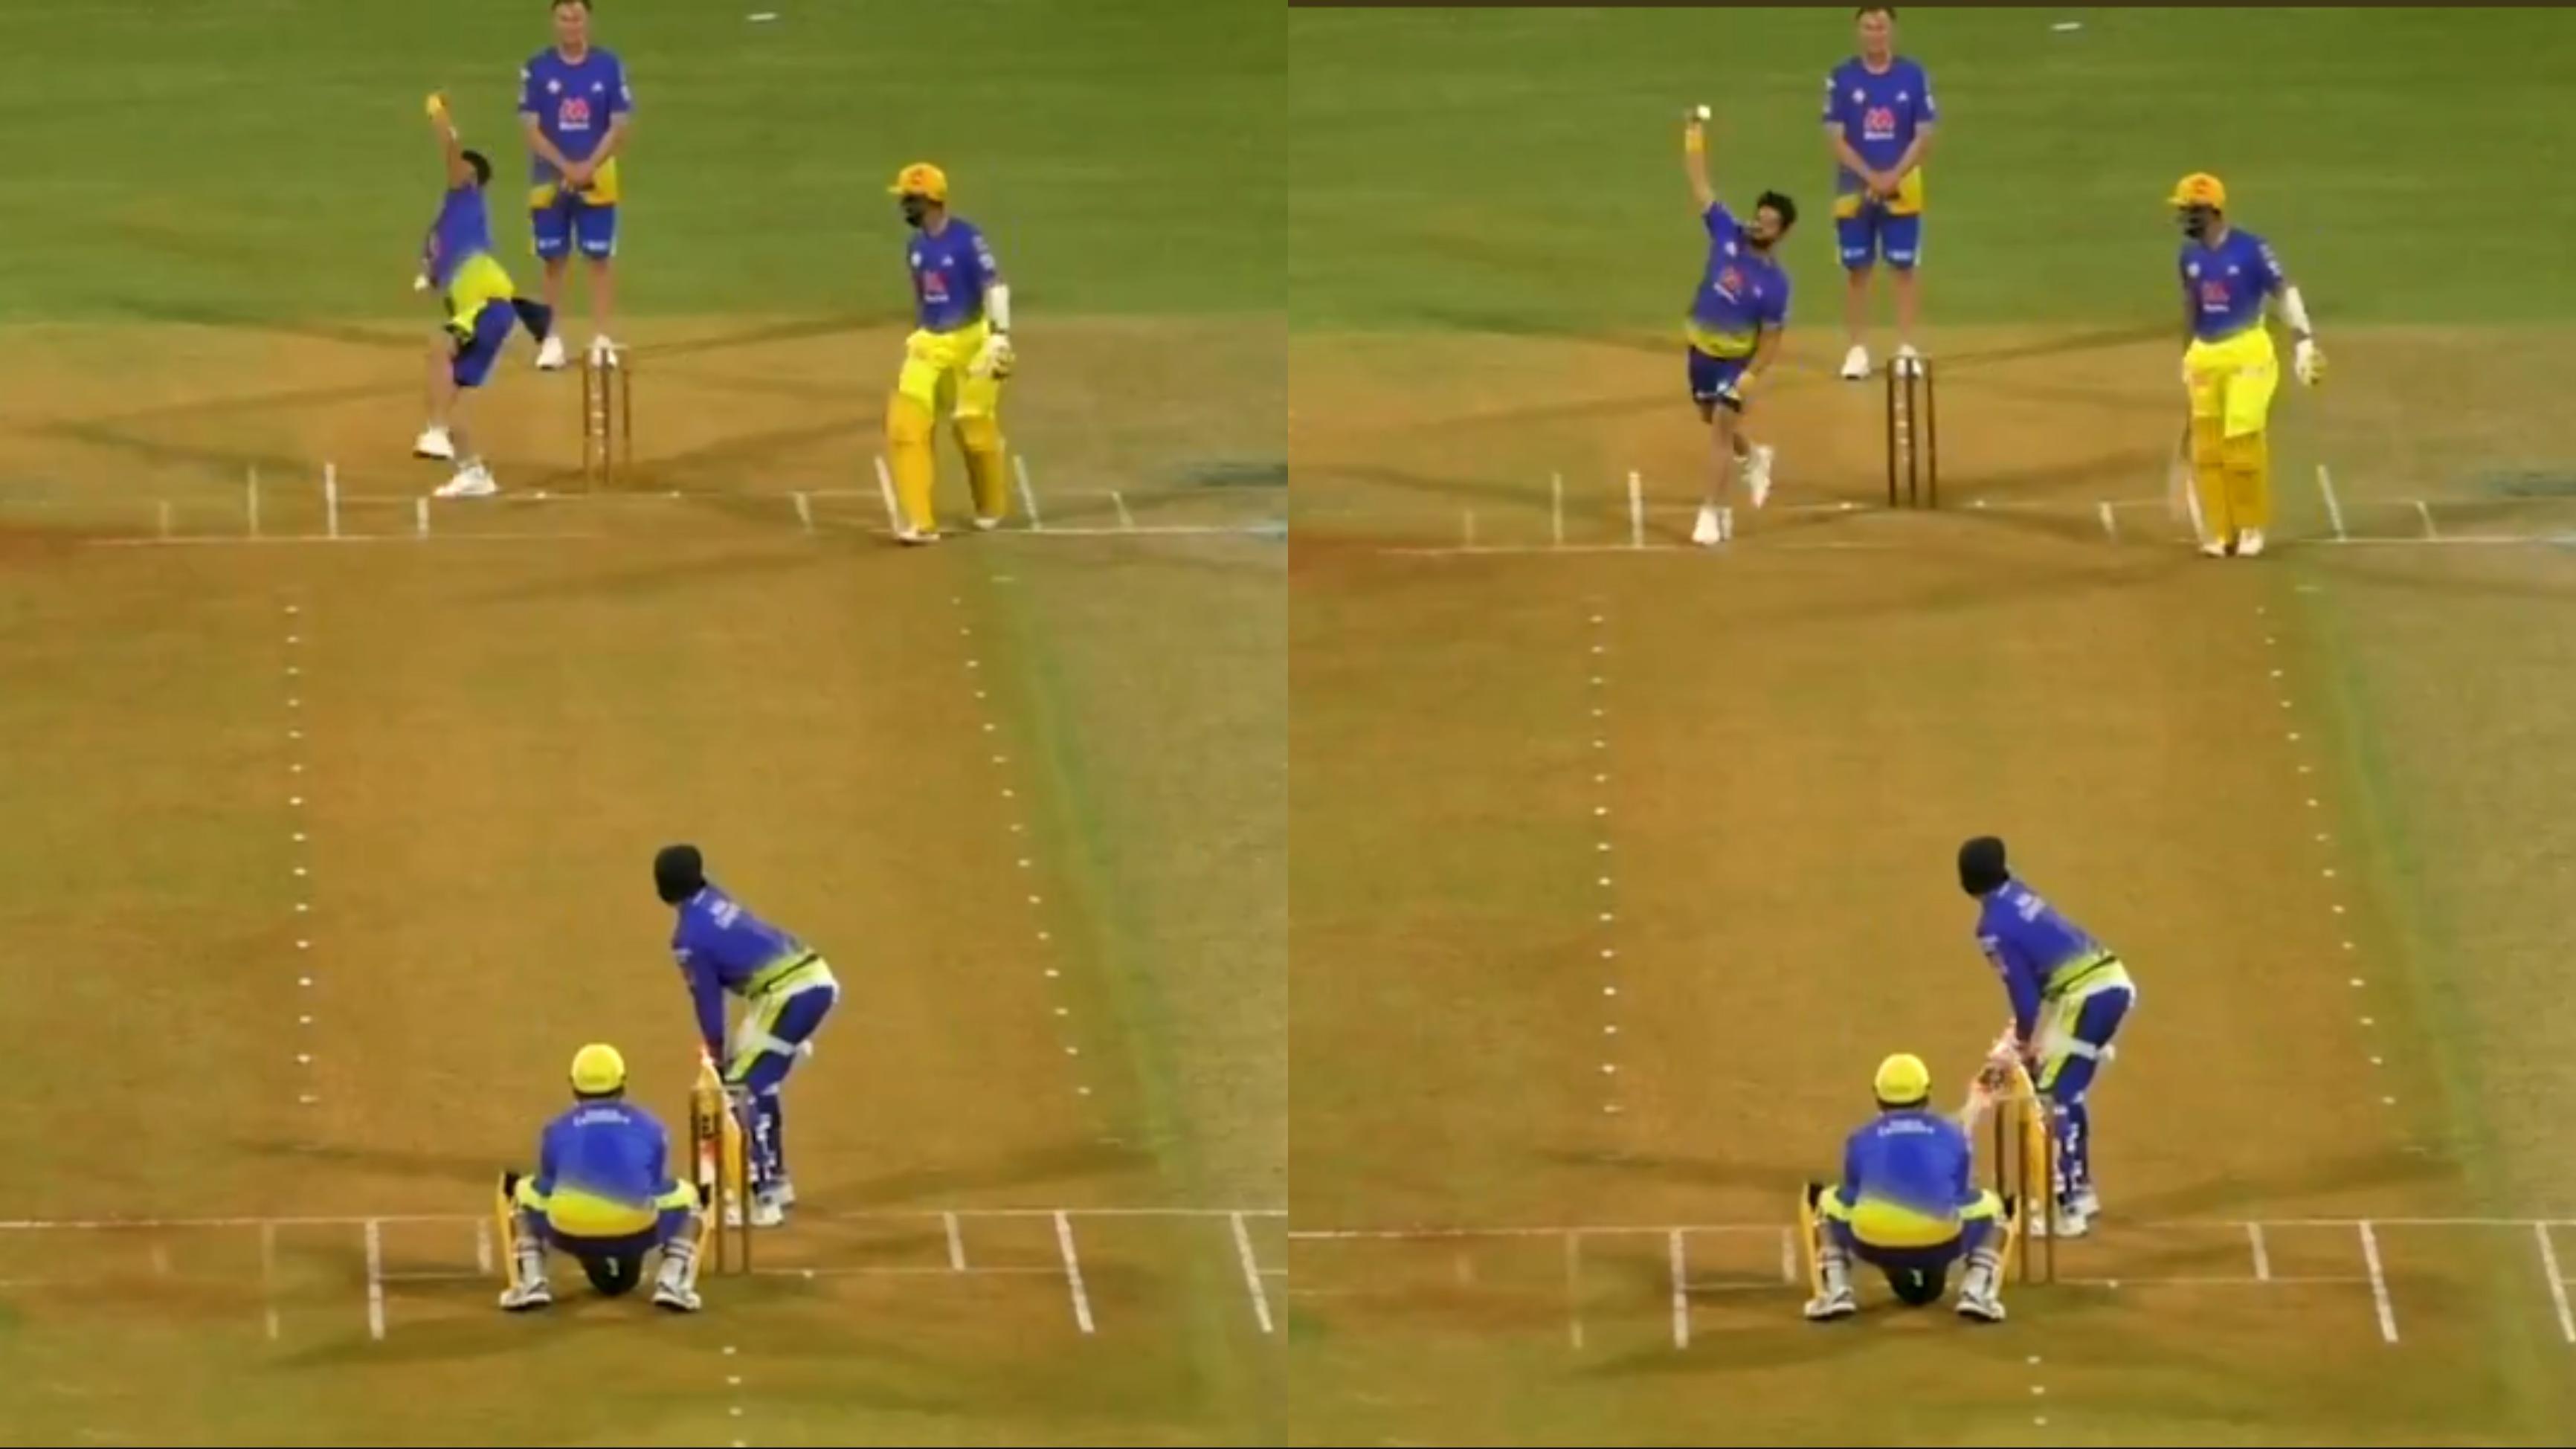 Watch: Suresh Raina bowls in CSK's practice match